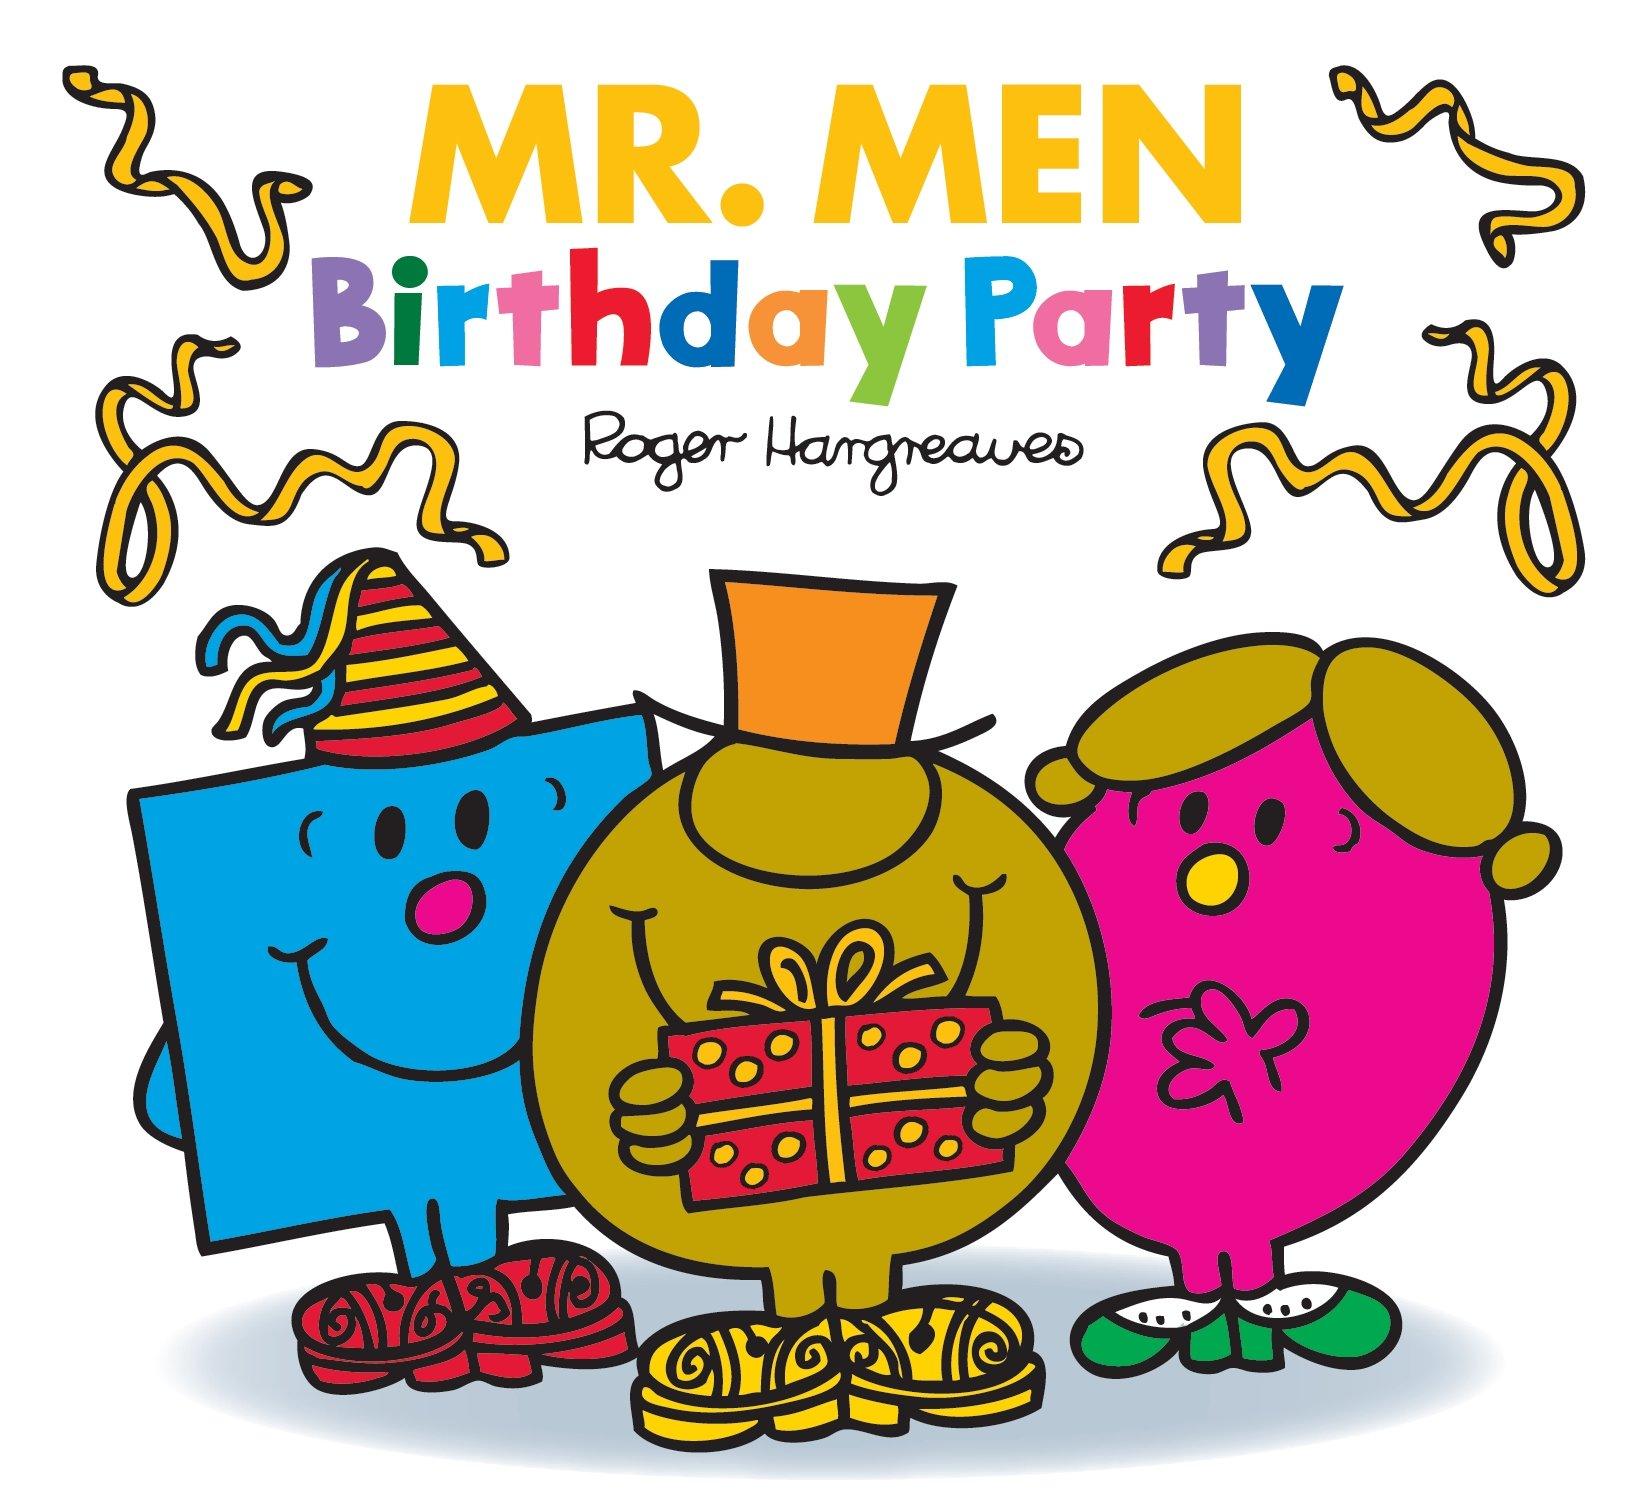 Mr Men Birthday Party Mr Men Little Miss Celebrations Adam